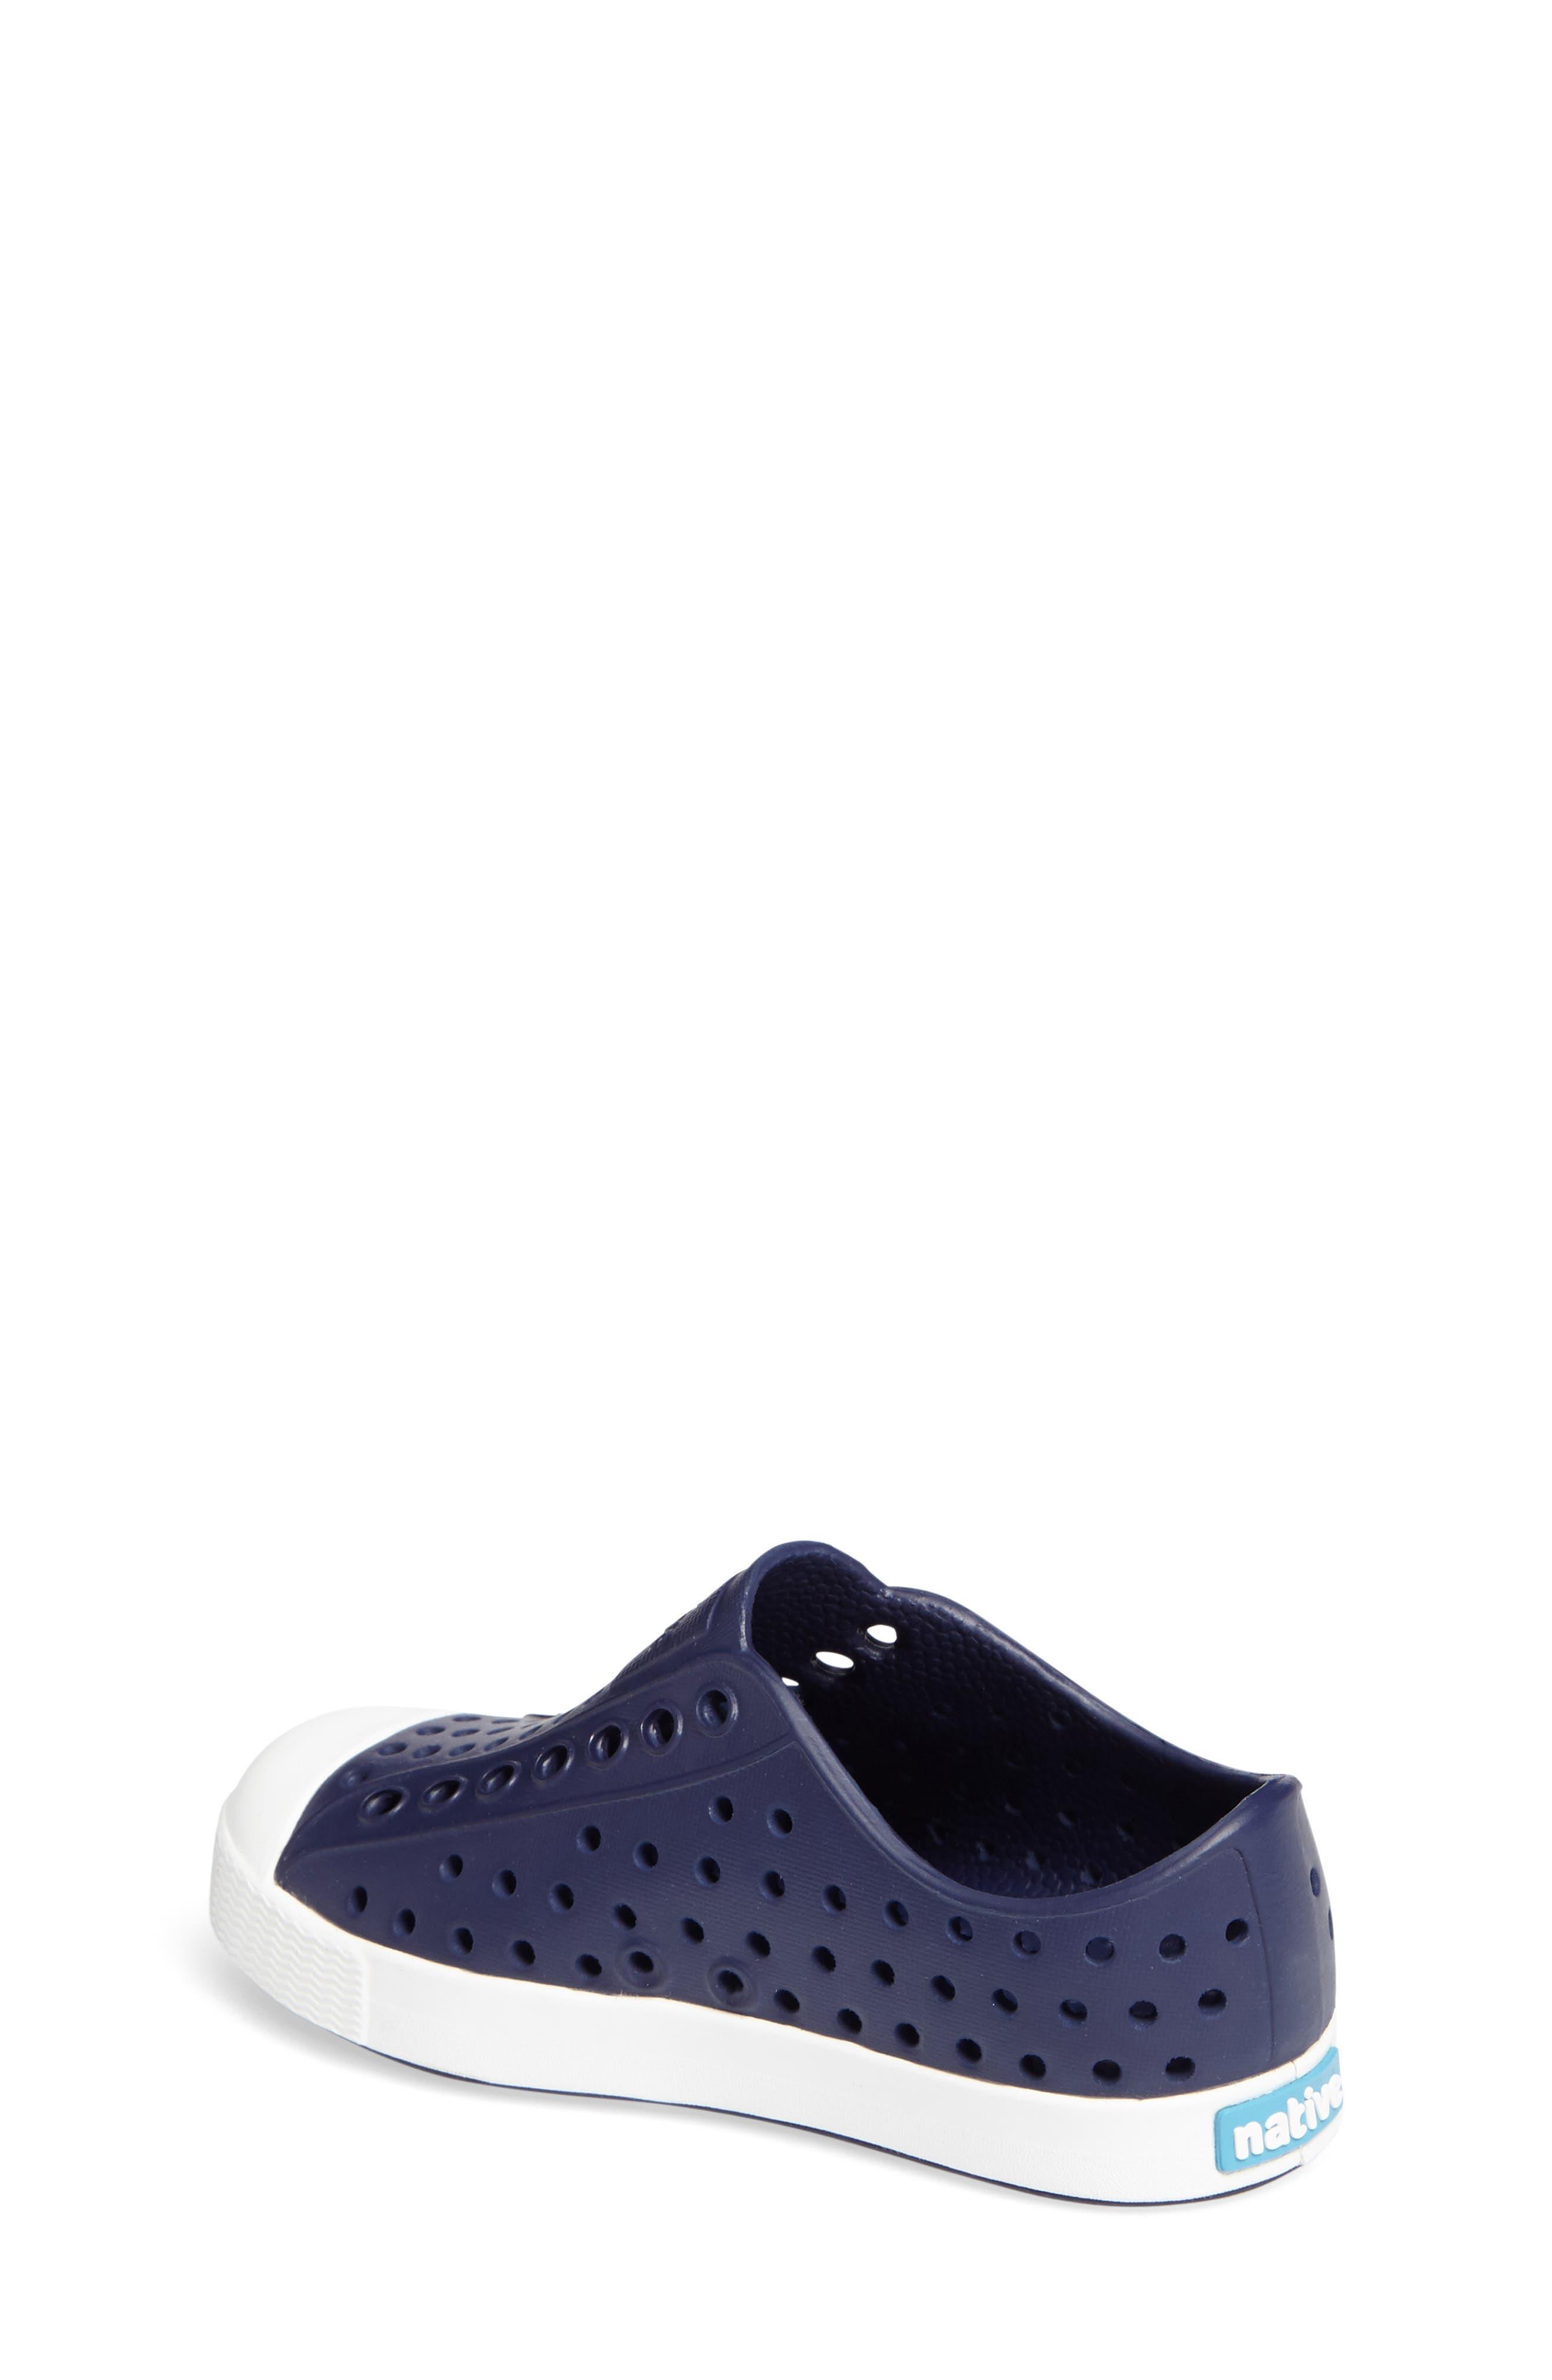 NATIVE SHOES,                             Jefferson Water Friendly Slip-On Vegan Sneaker,                             Alternate thumbnail 2, color,                             REGATTA BLUE/ SHELL WHITE